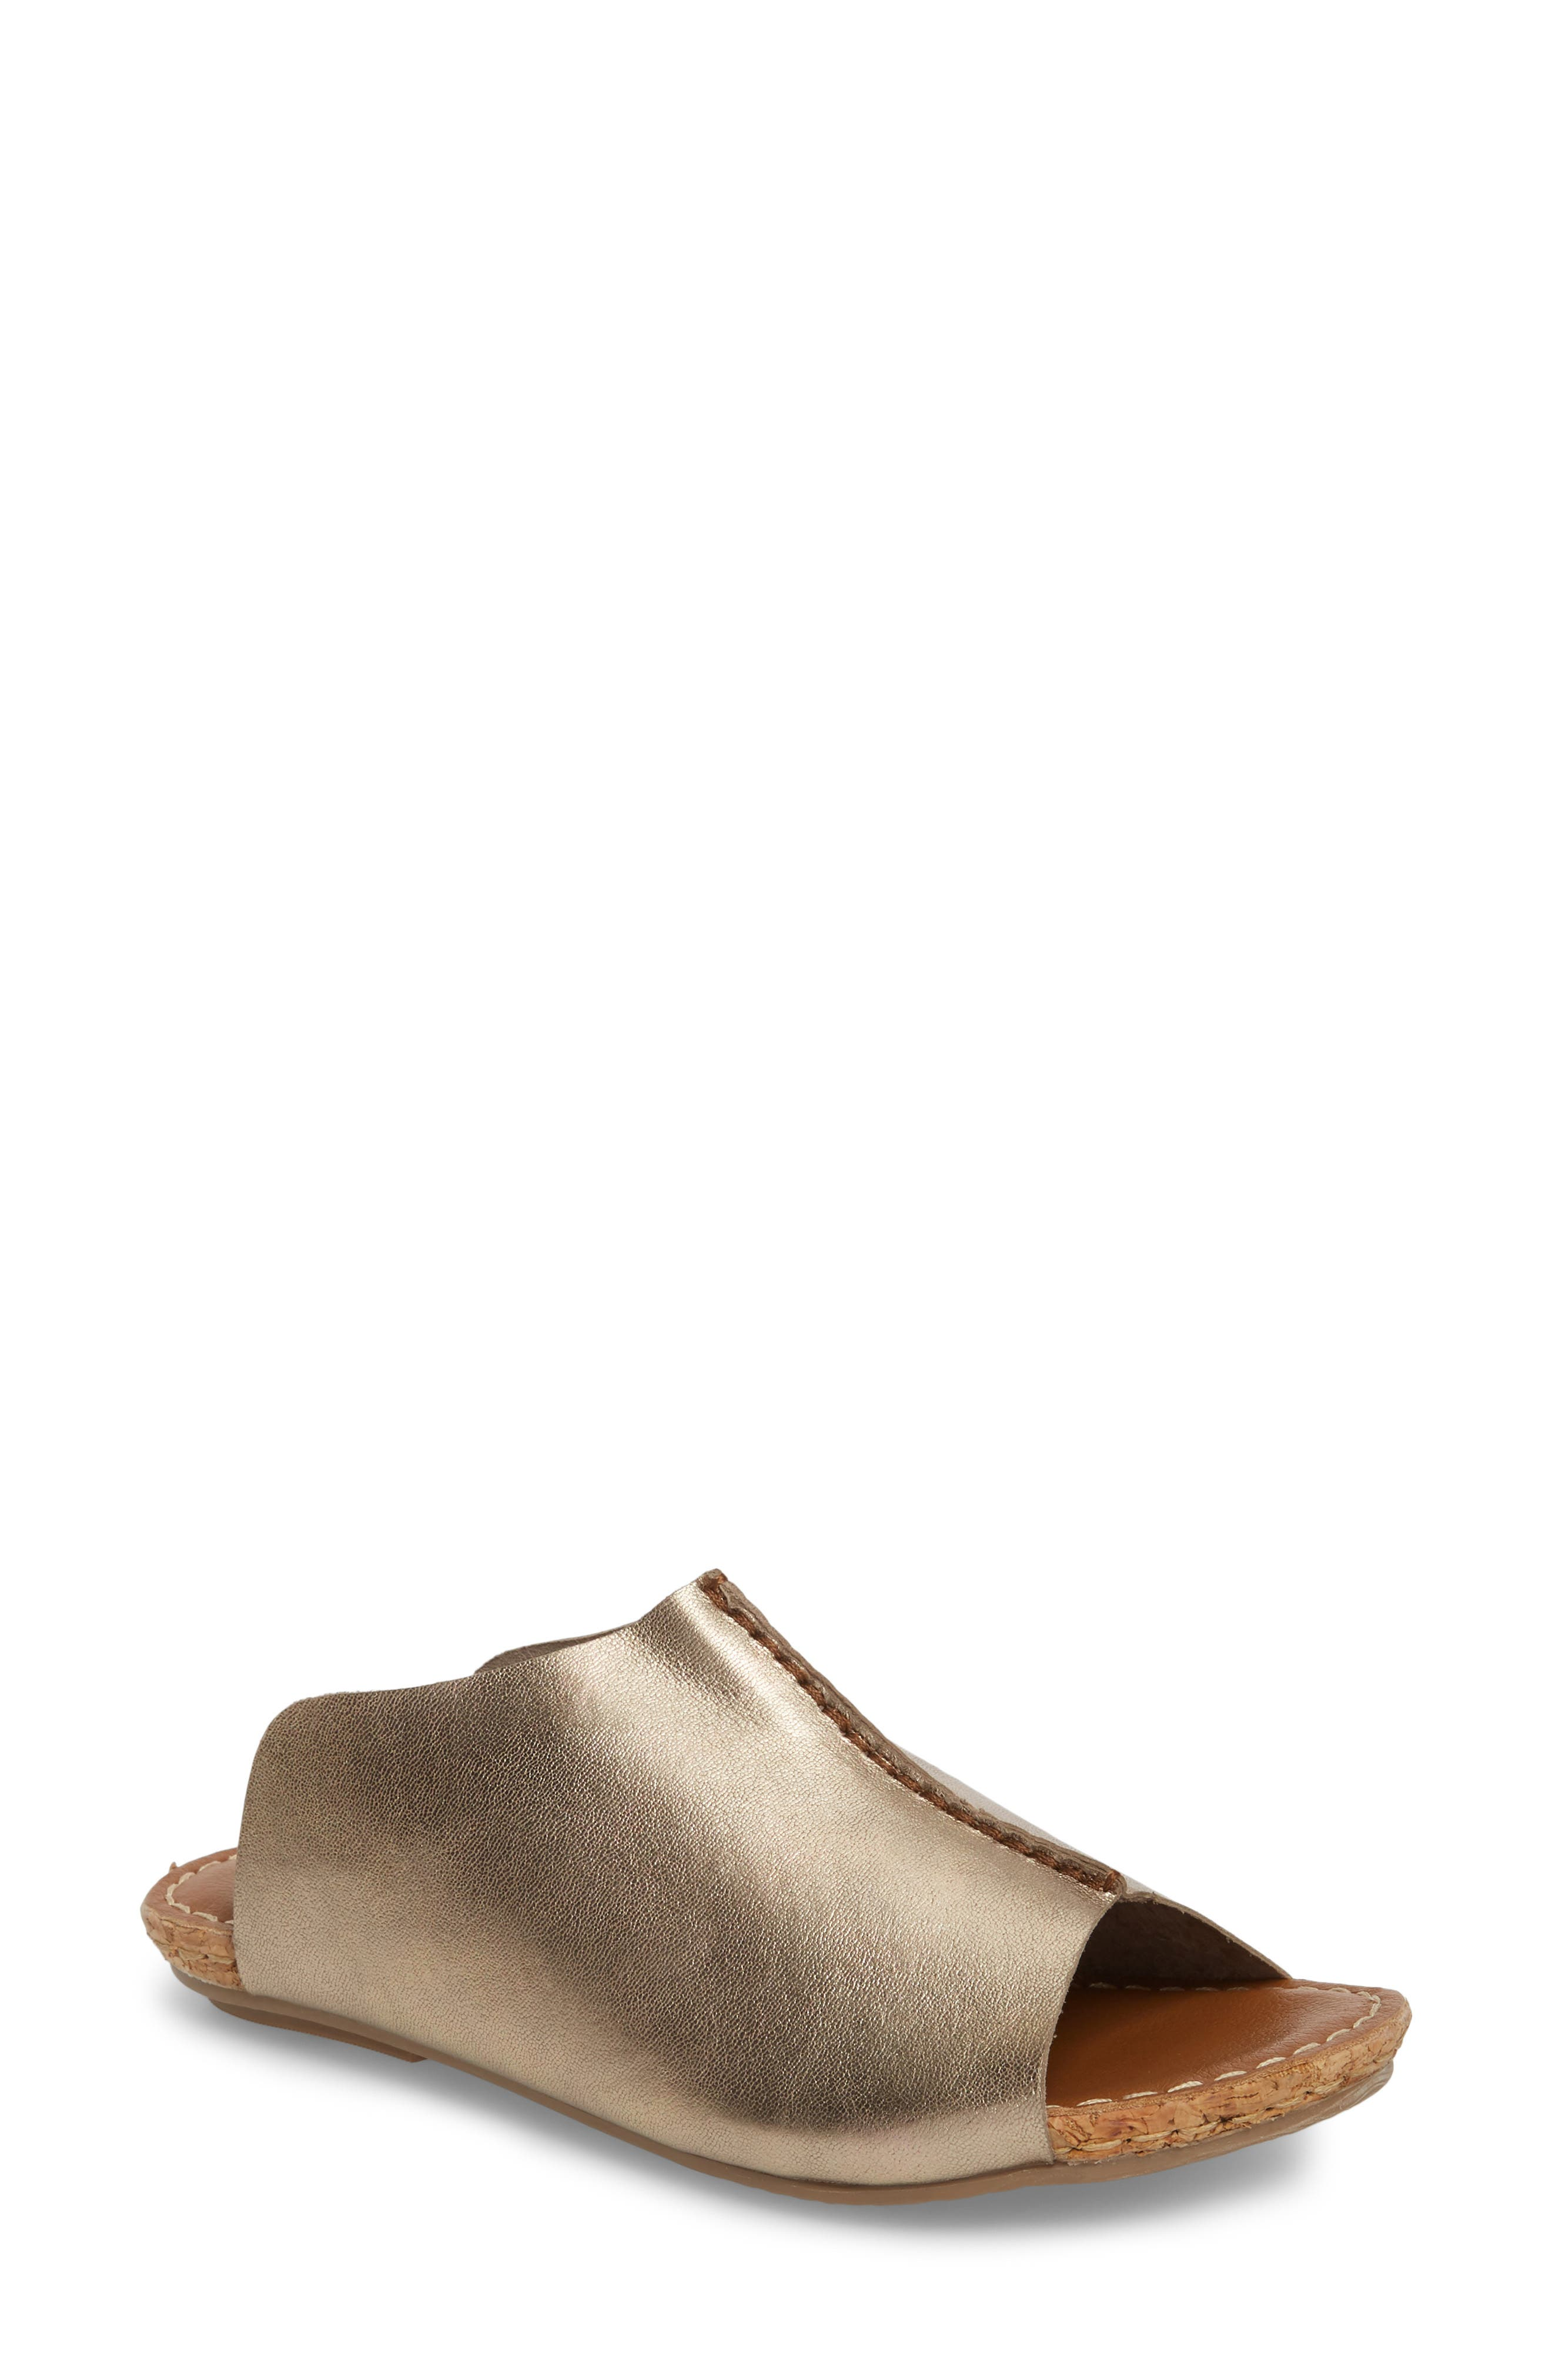 Klub Nico Gracey Slide Sandal, Metallic